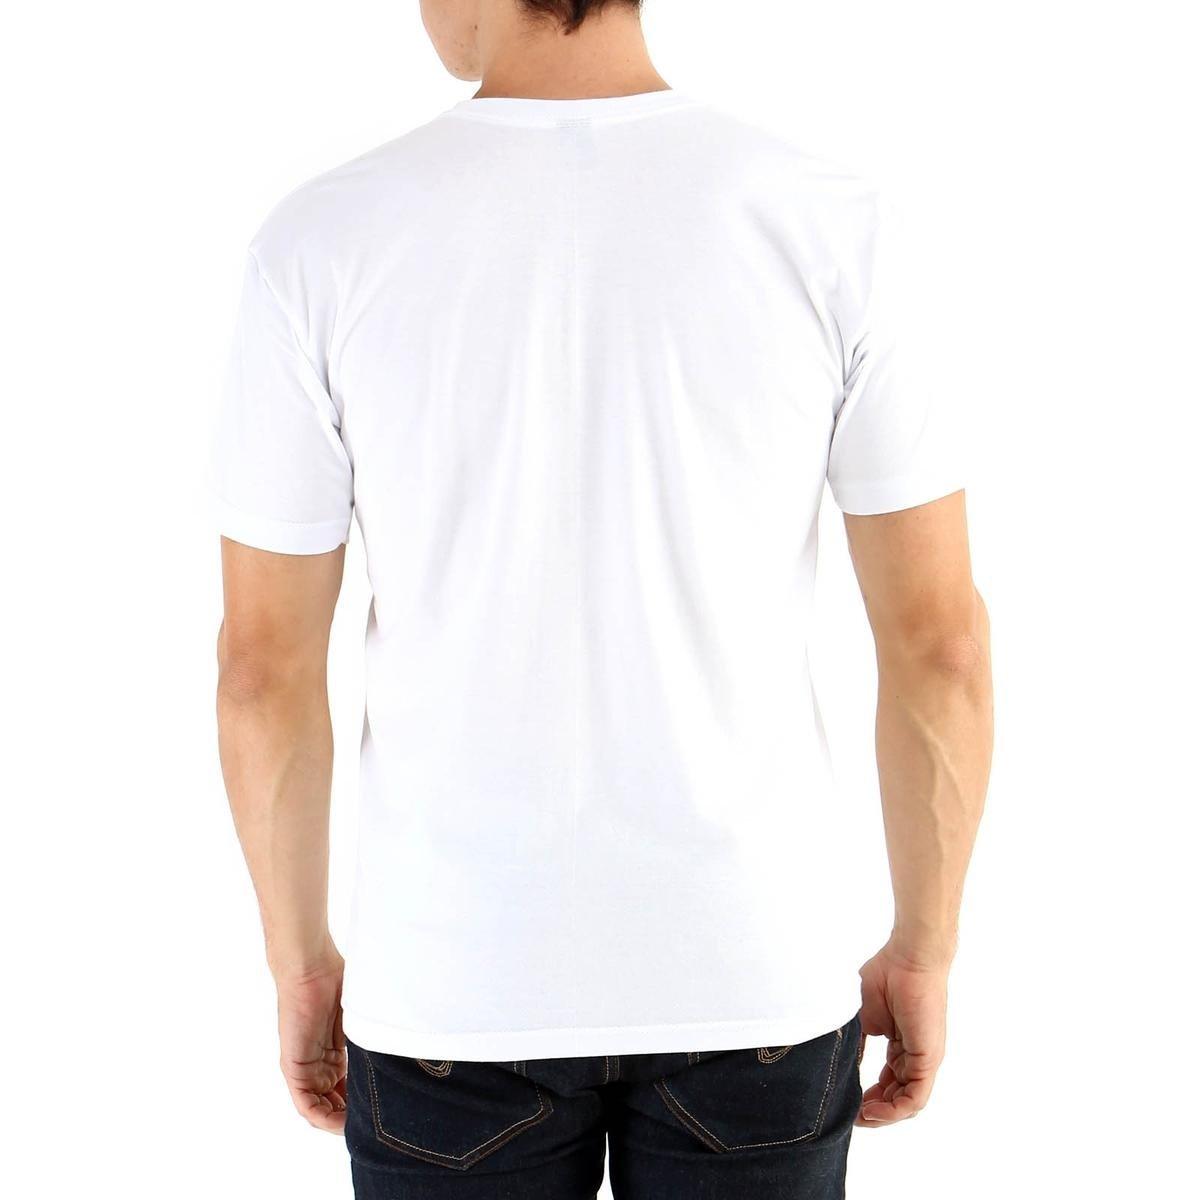 822898503d4 Camiseta Ouroboros manga curta John Constantine - Branco - Compre ...